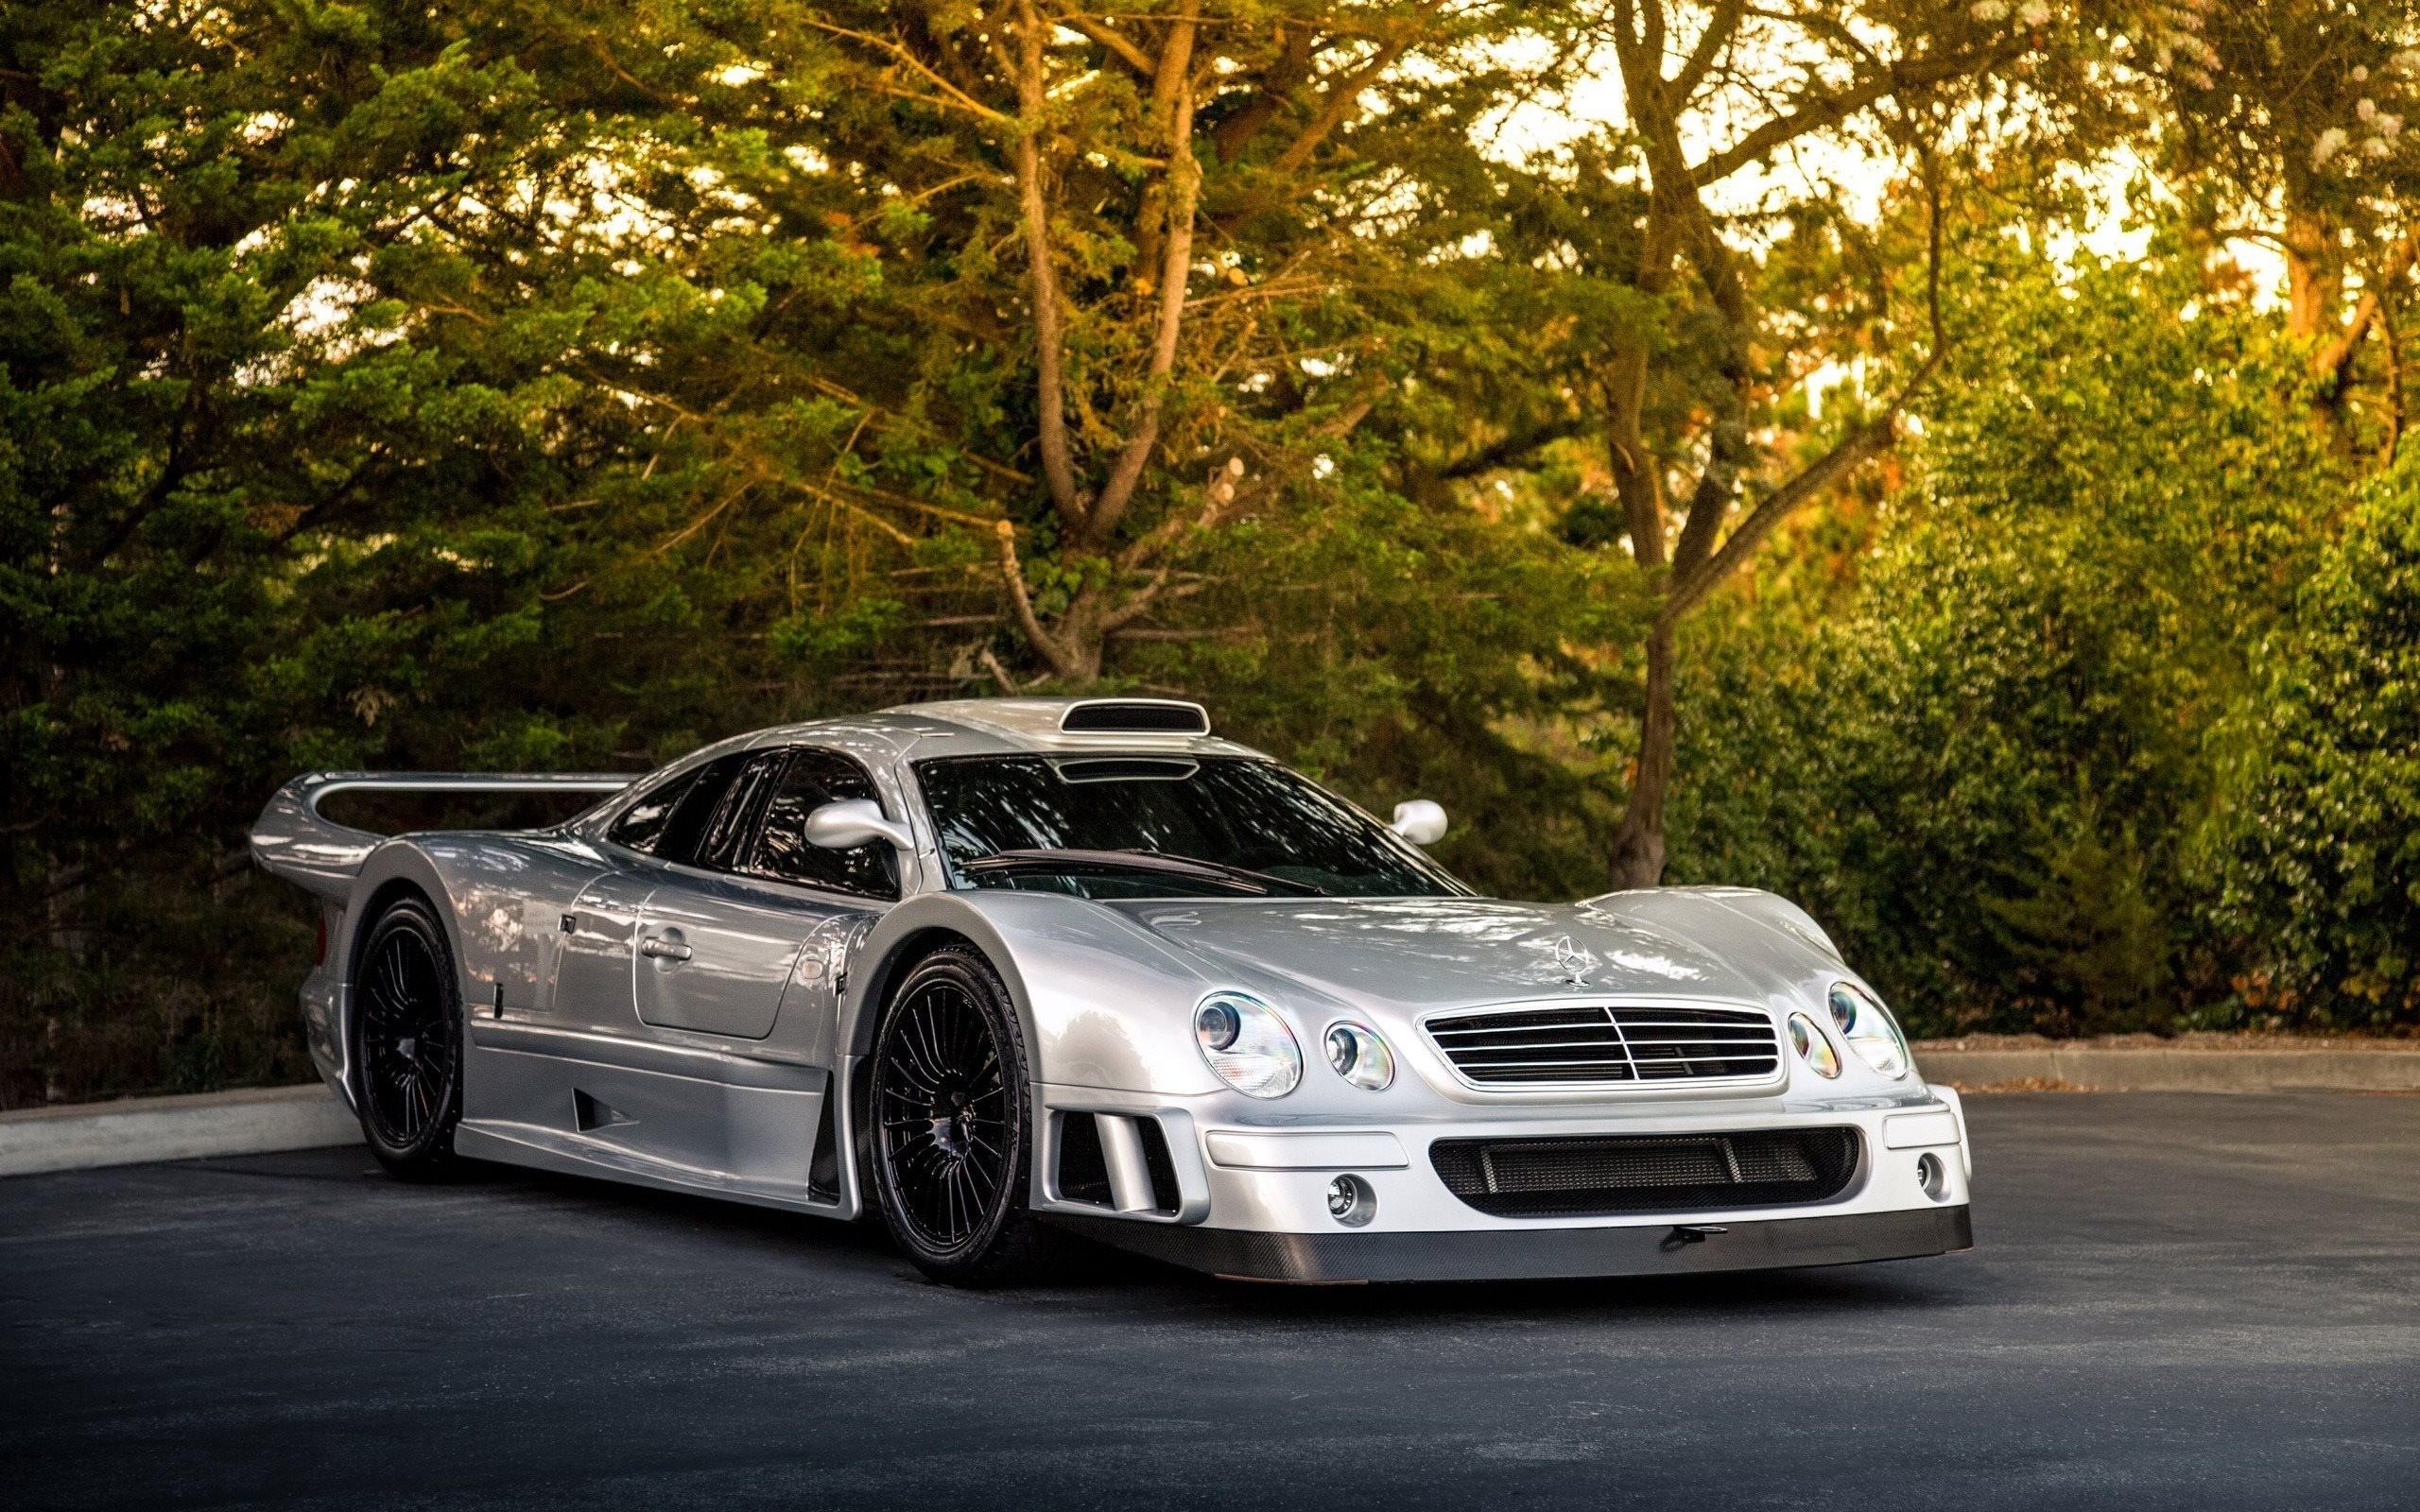 Mercedes-Benz CLK GTR AMG Coupe